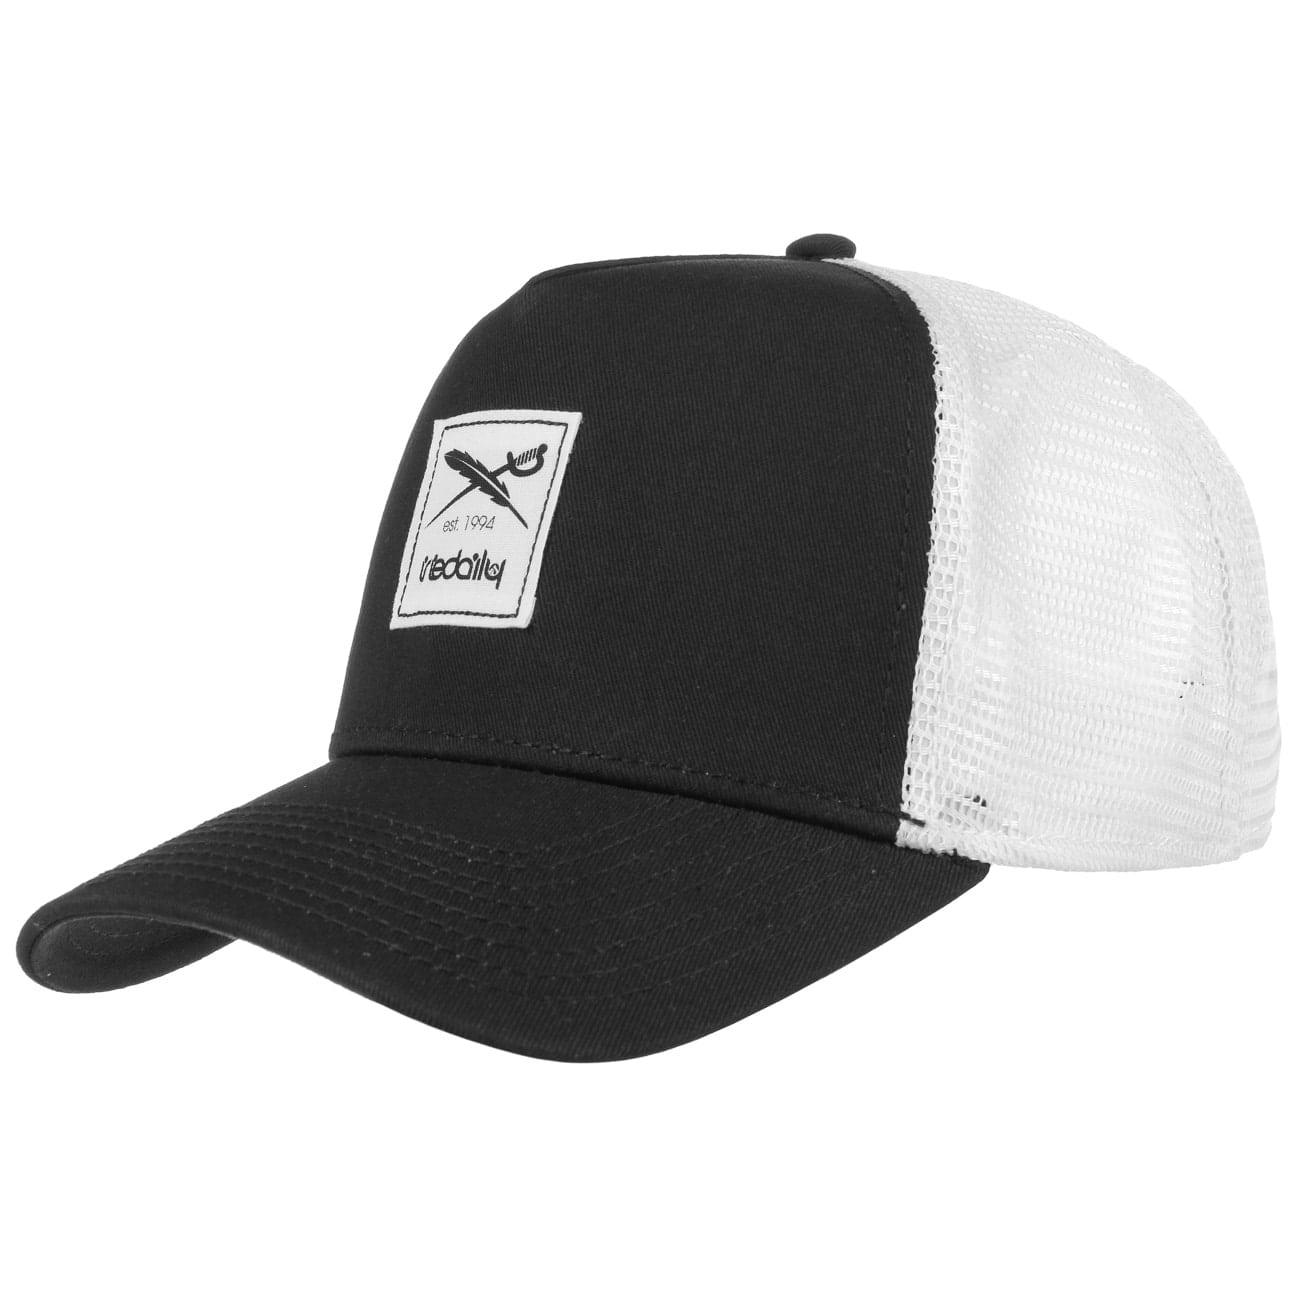 daily-flag-mesh-trucker-cap-by-iriedaily-baseballcap